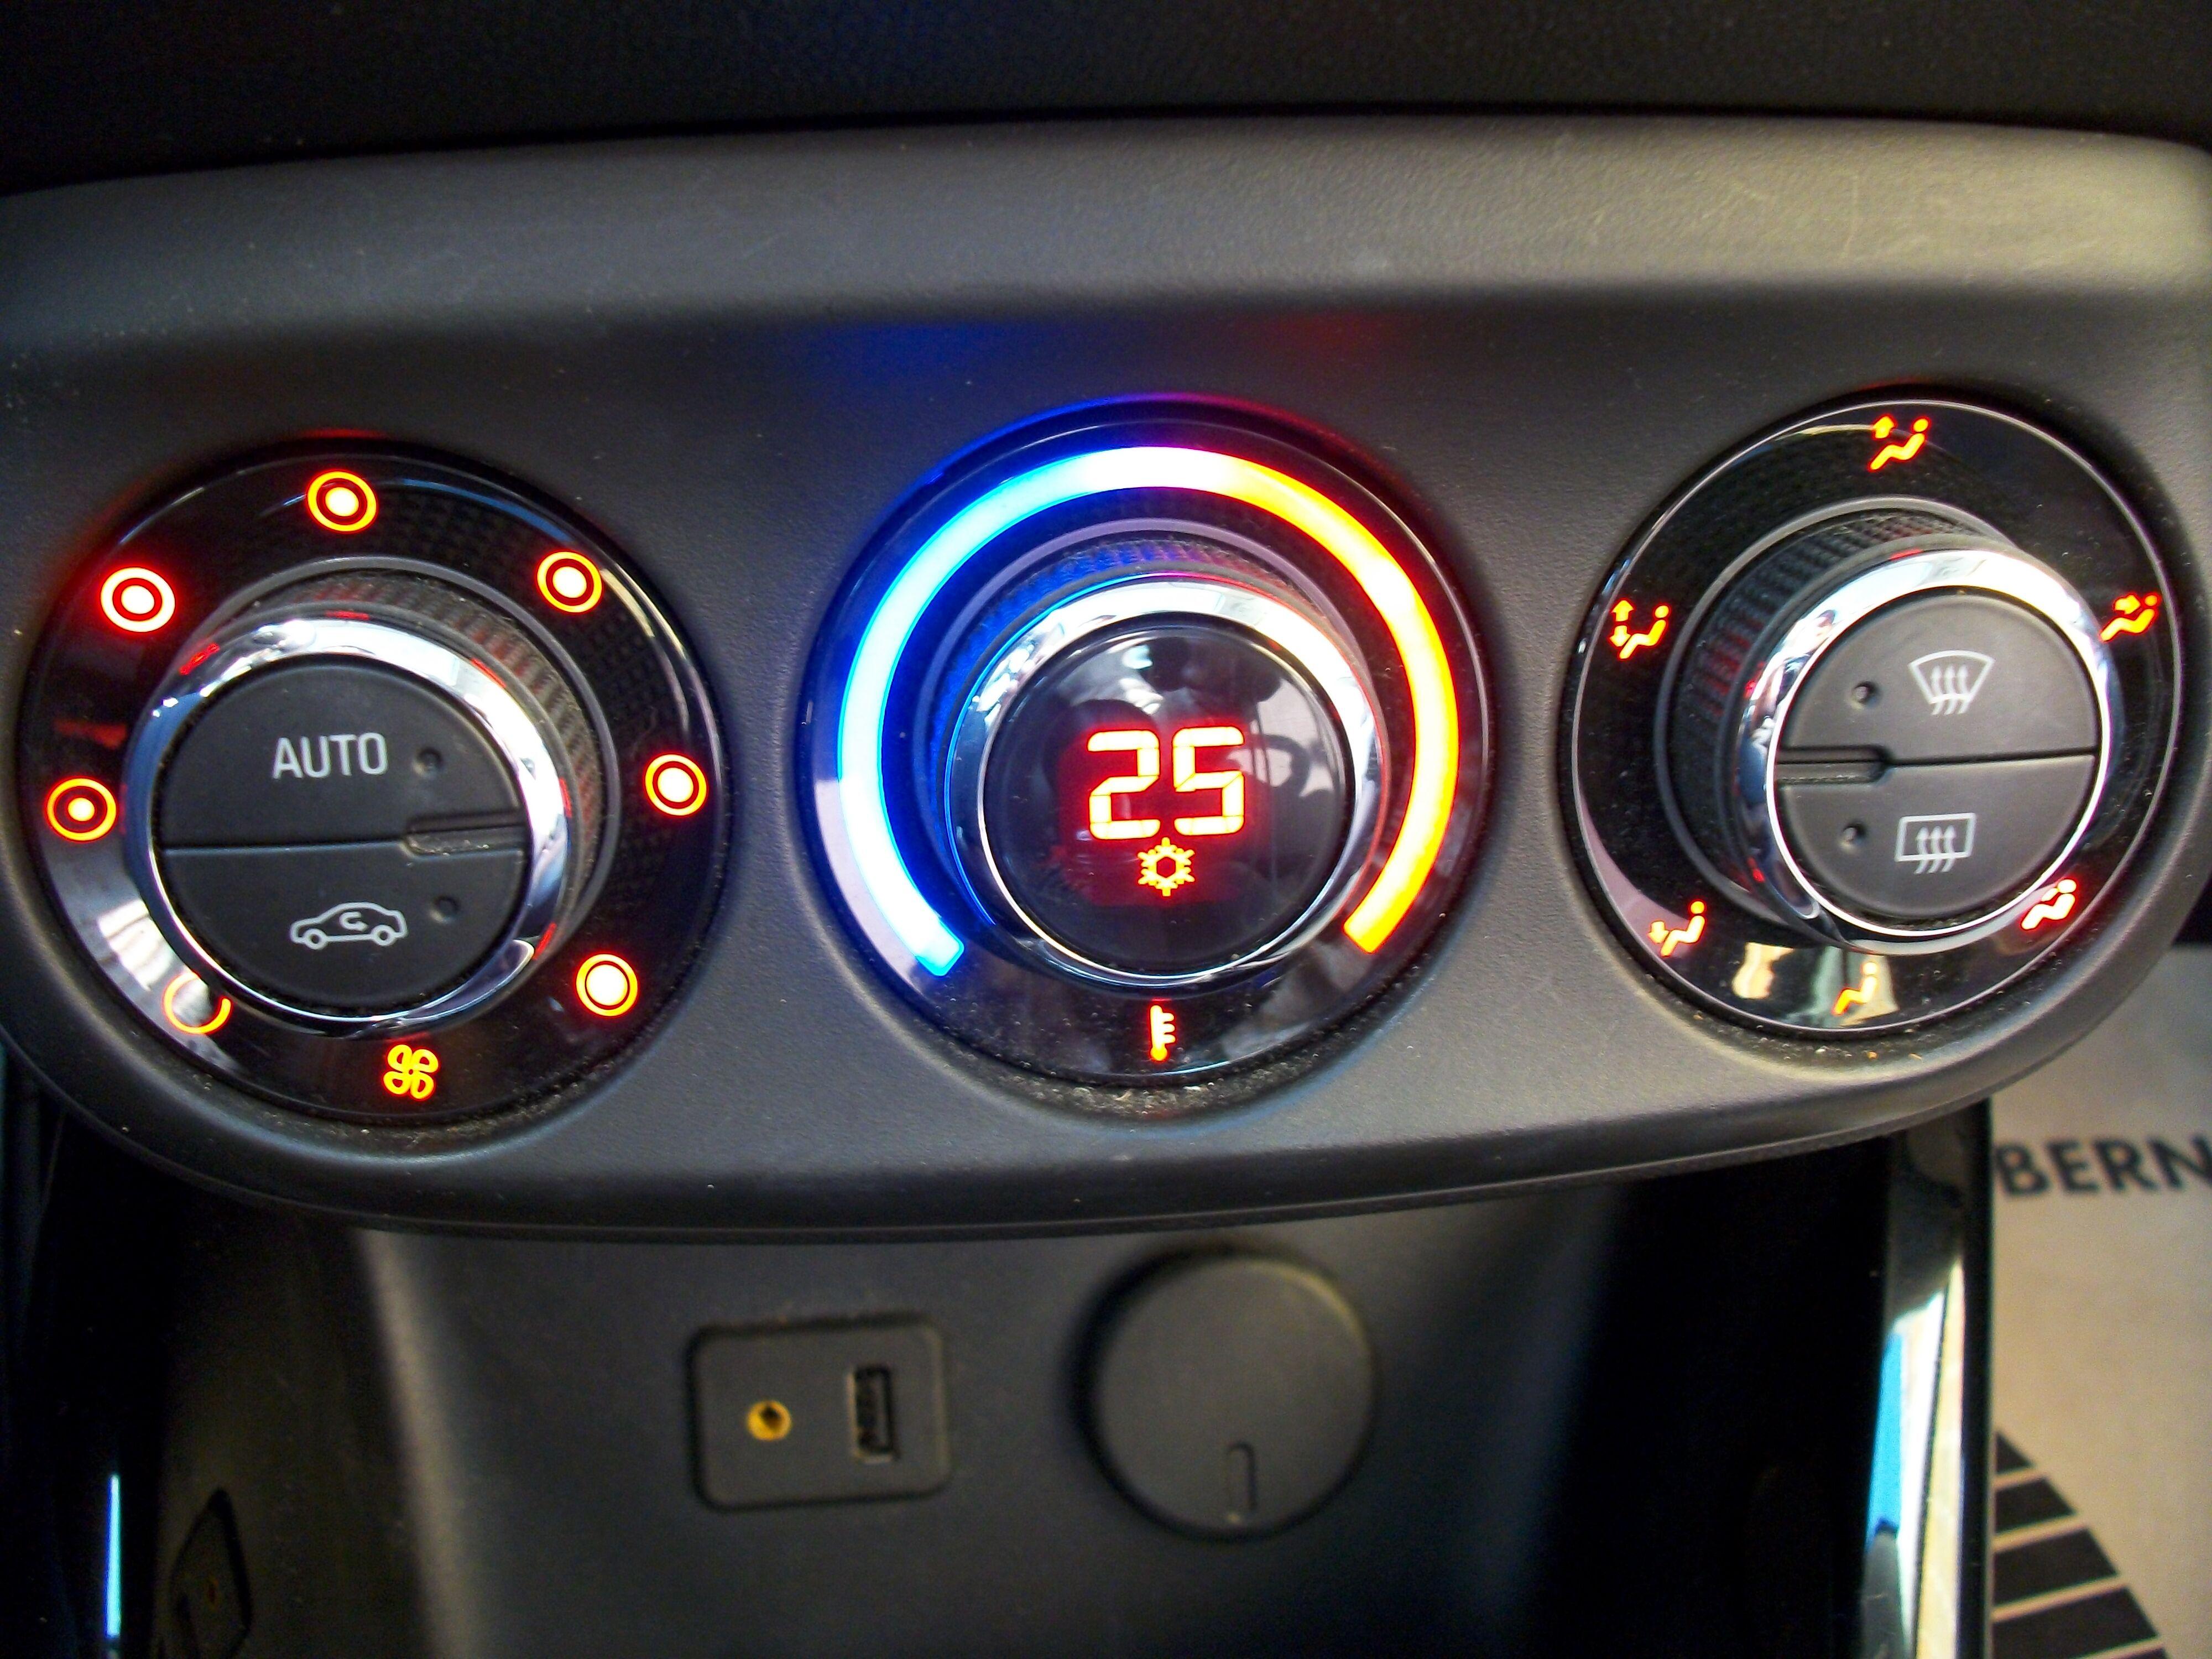 Opel ADAM SLAM 1.2 Benz. - weinig kilometers 4/12